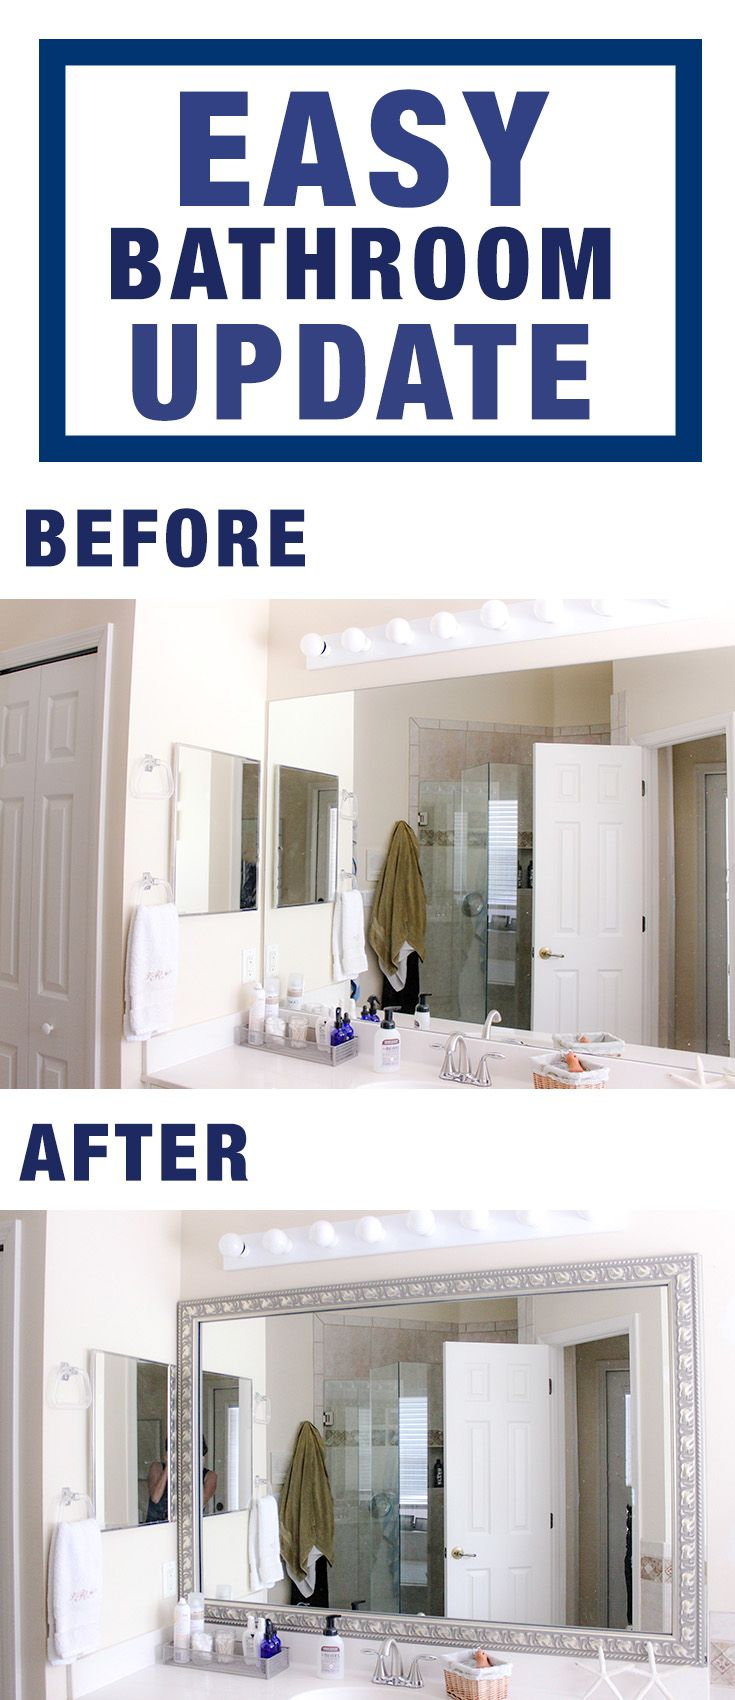 Easy bathroom updates